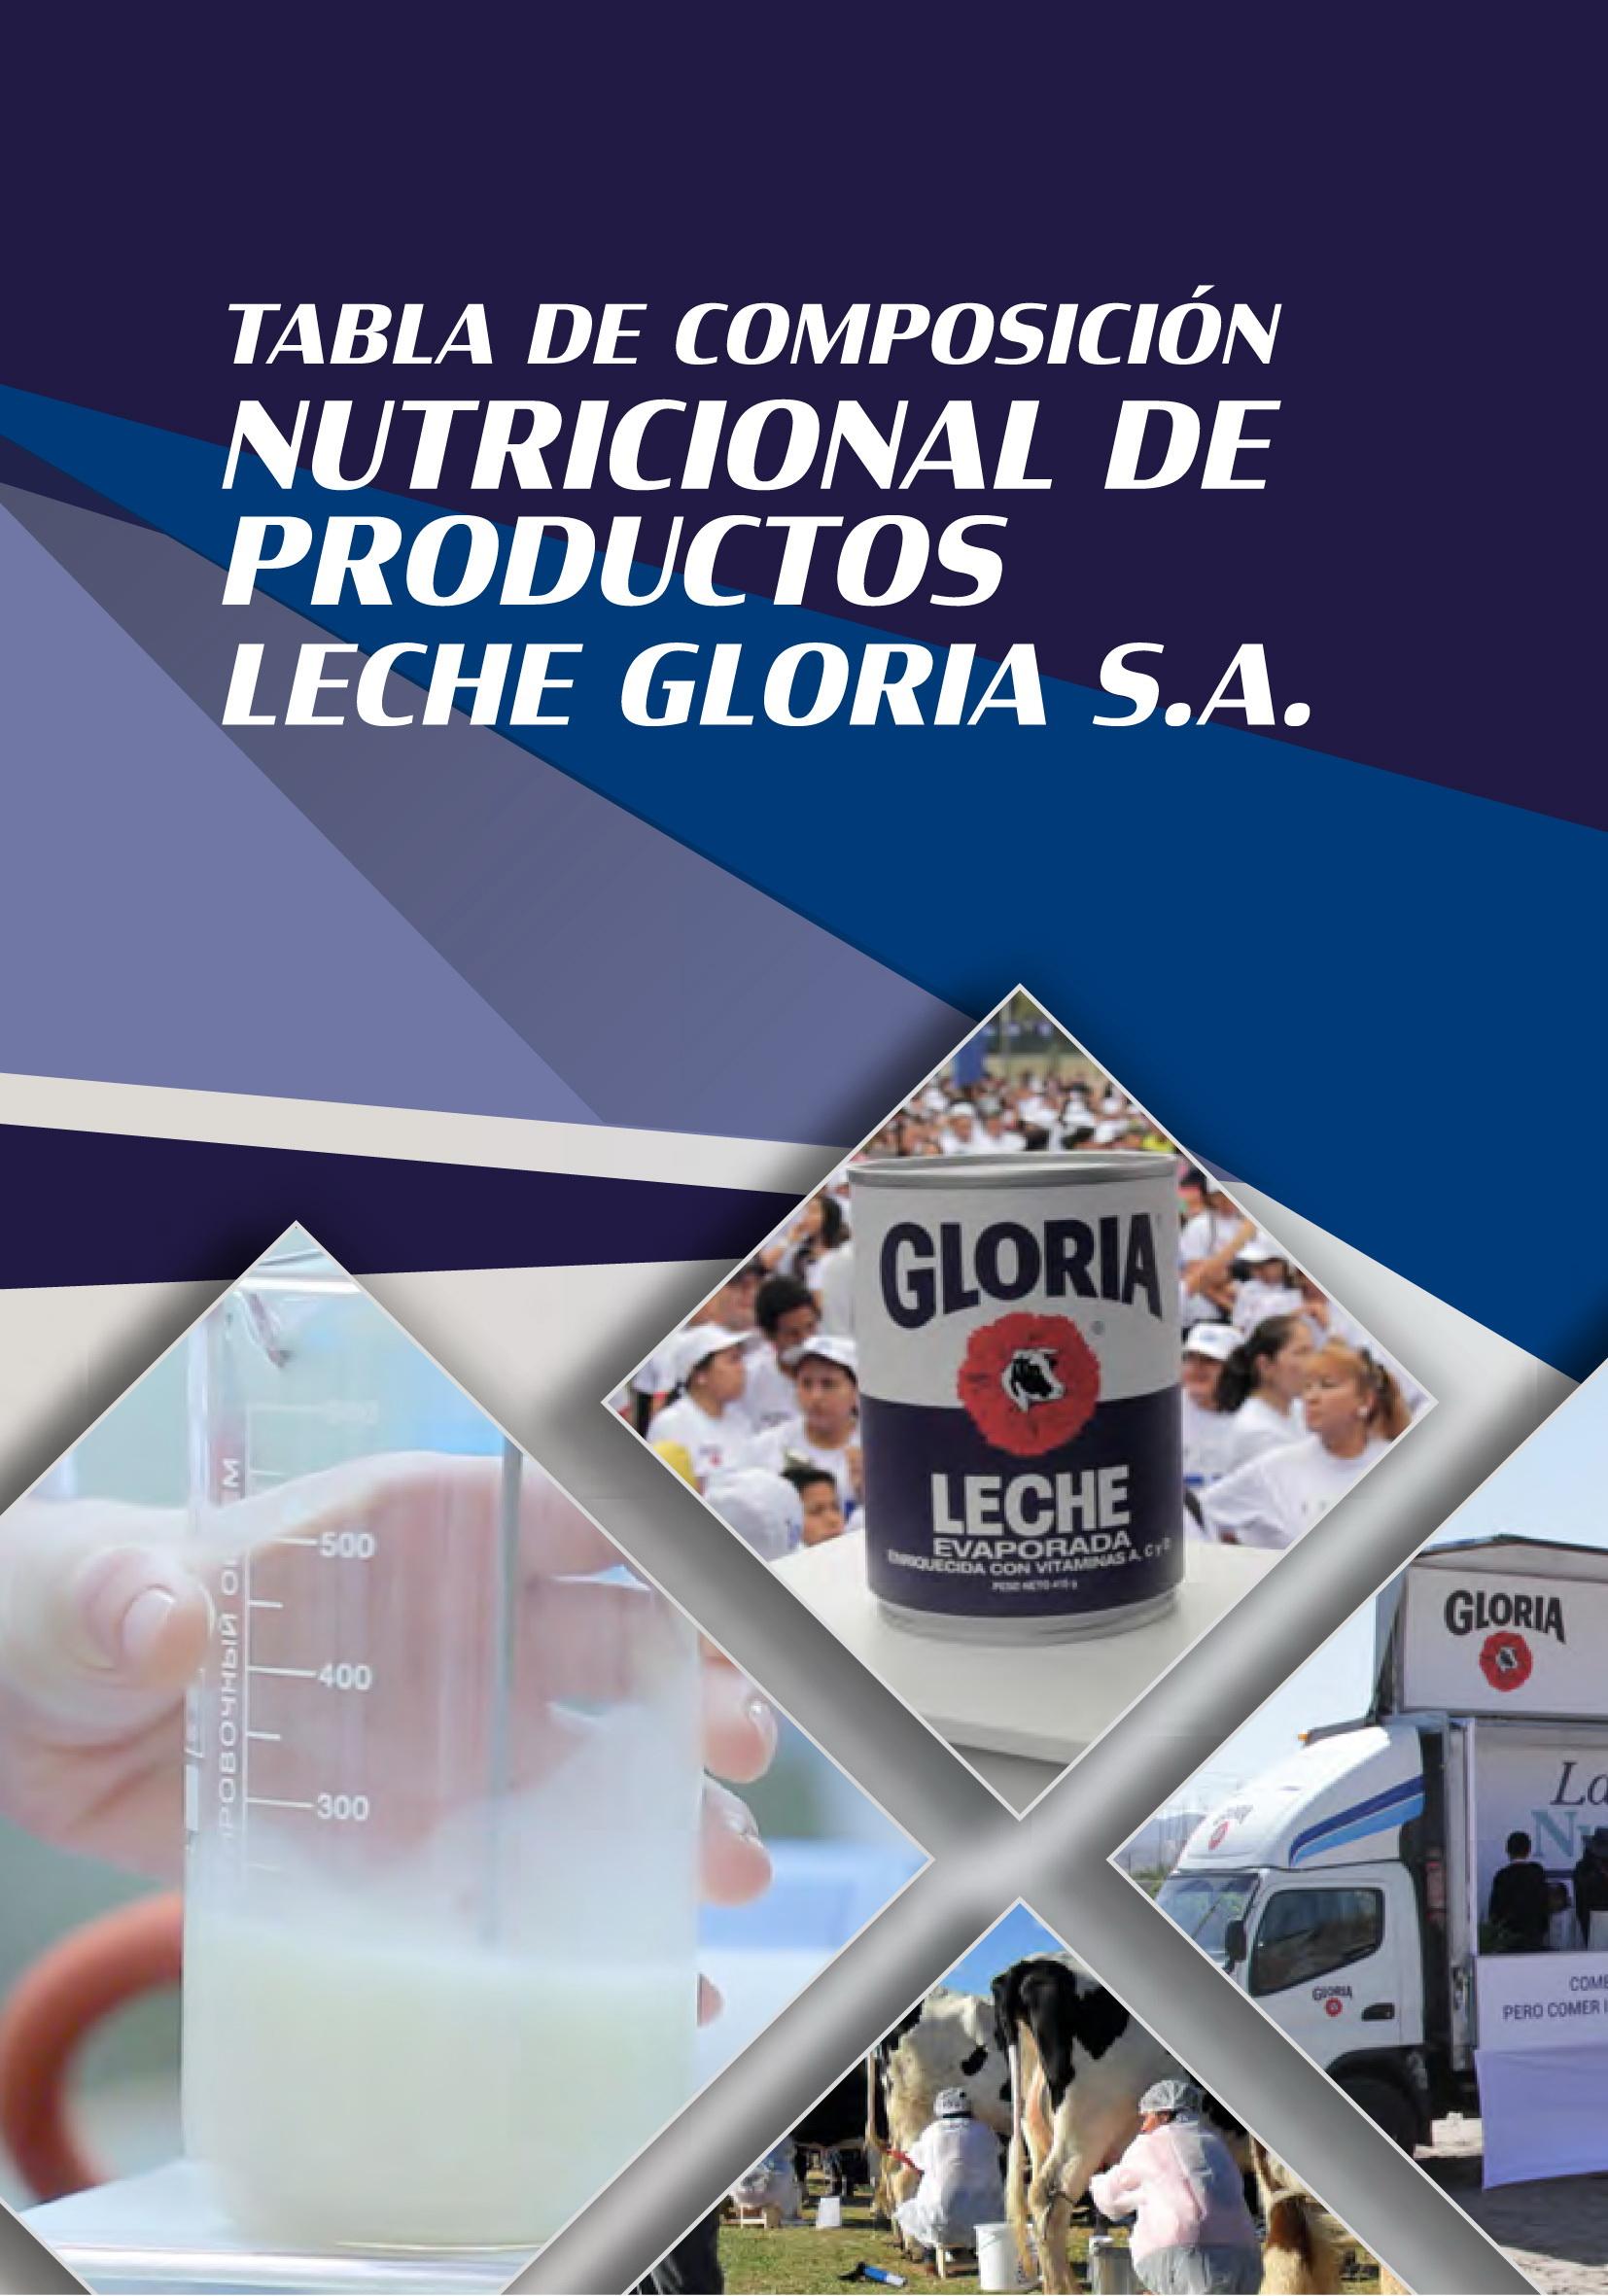 Tabla de Composición Nutricional de Productos Leche Gloria S.A.